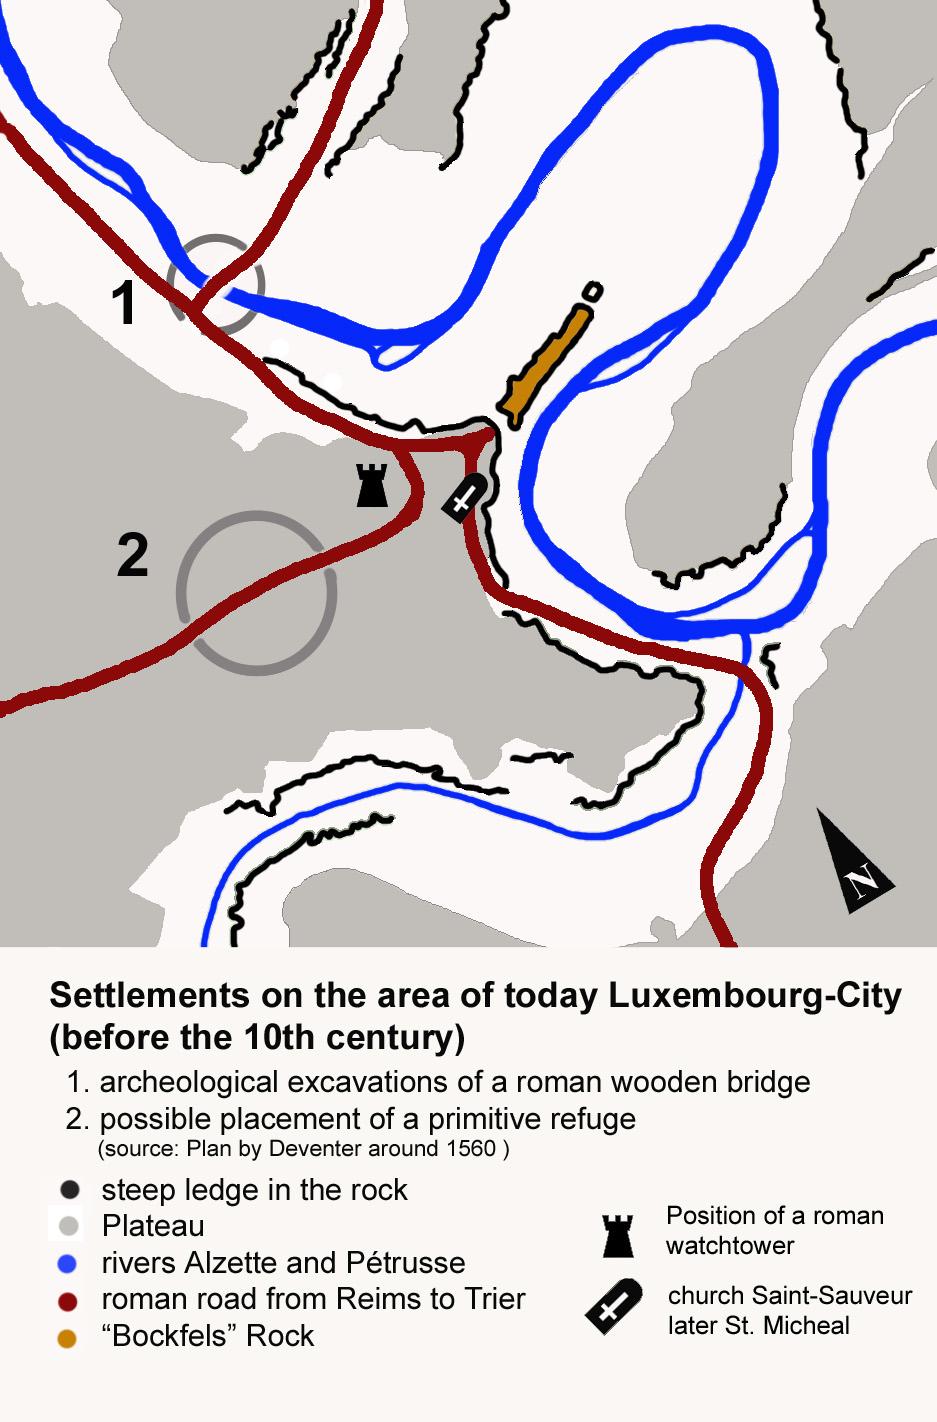 Depiction of Historia de Luxemburgo